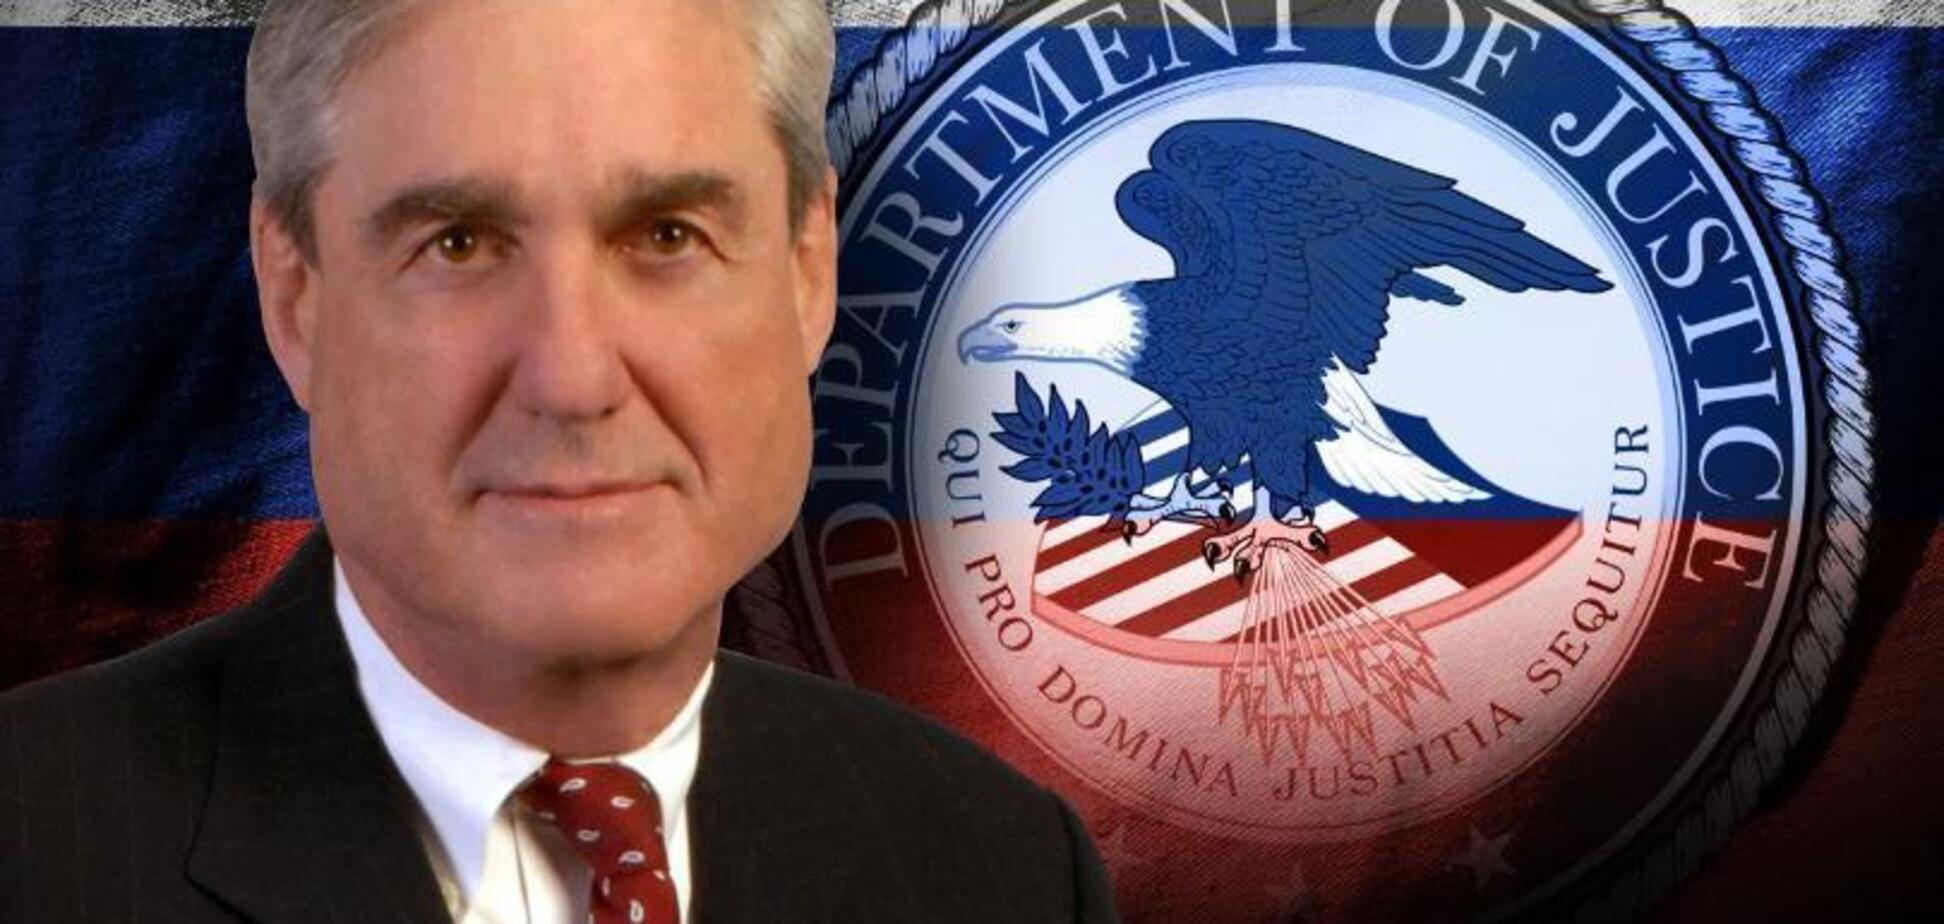 ''Откуда деньги?'' Названа причина интереса прокурора США к украинским политикам